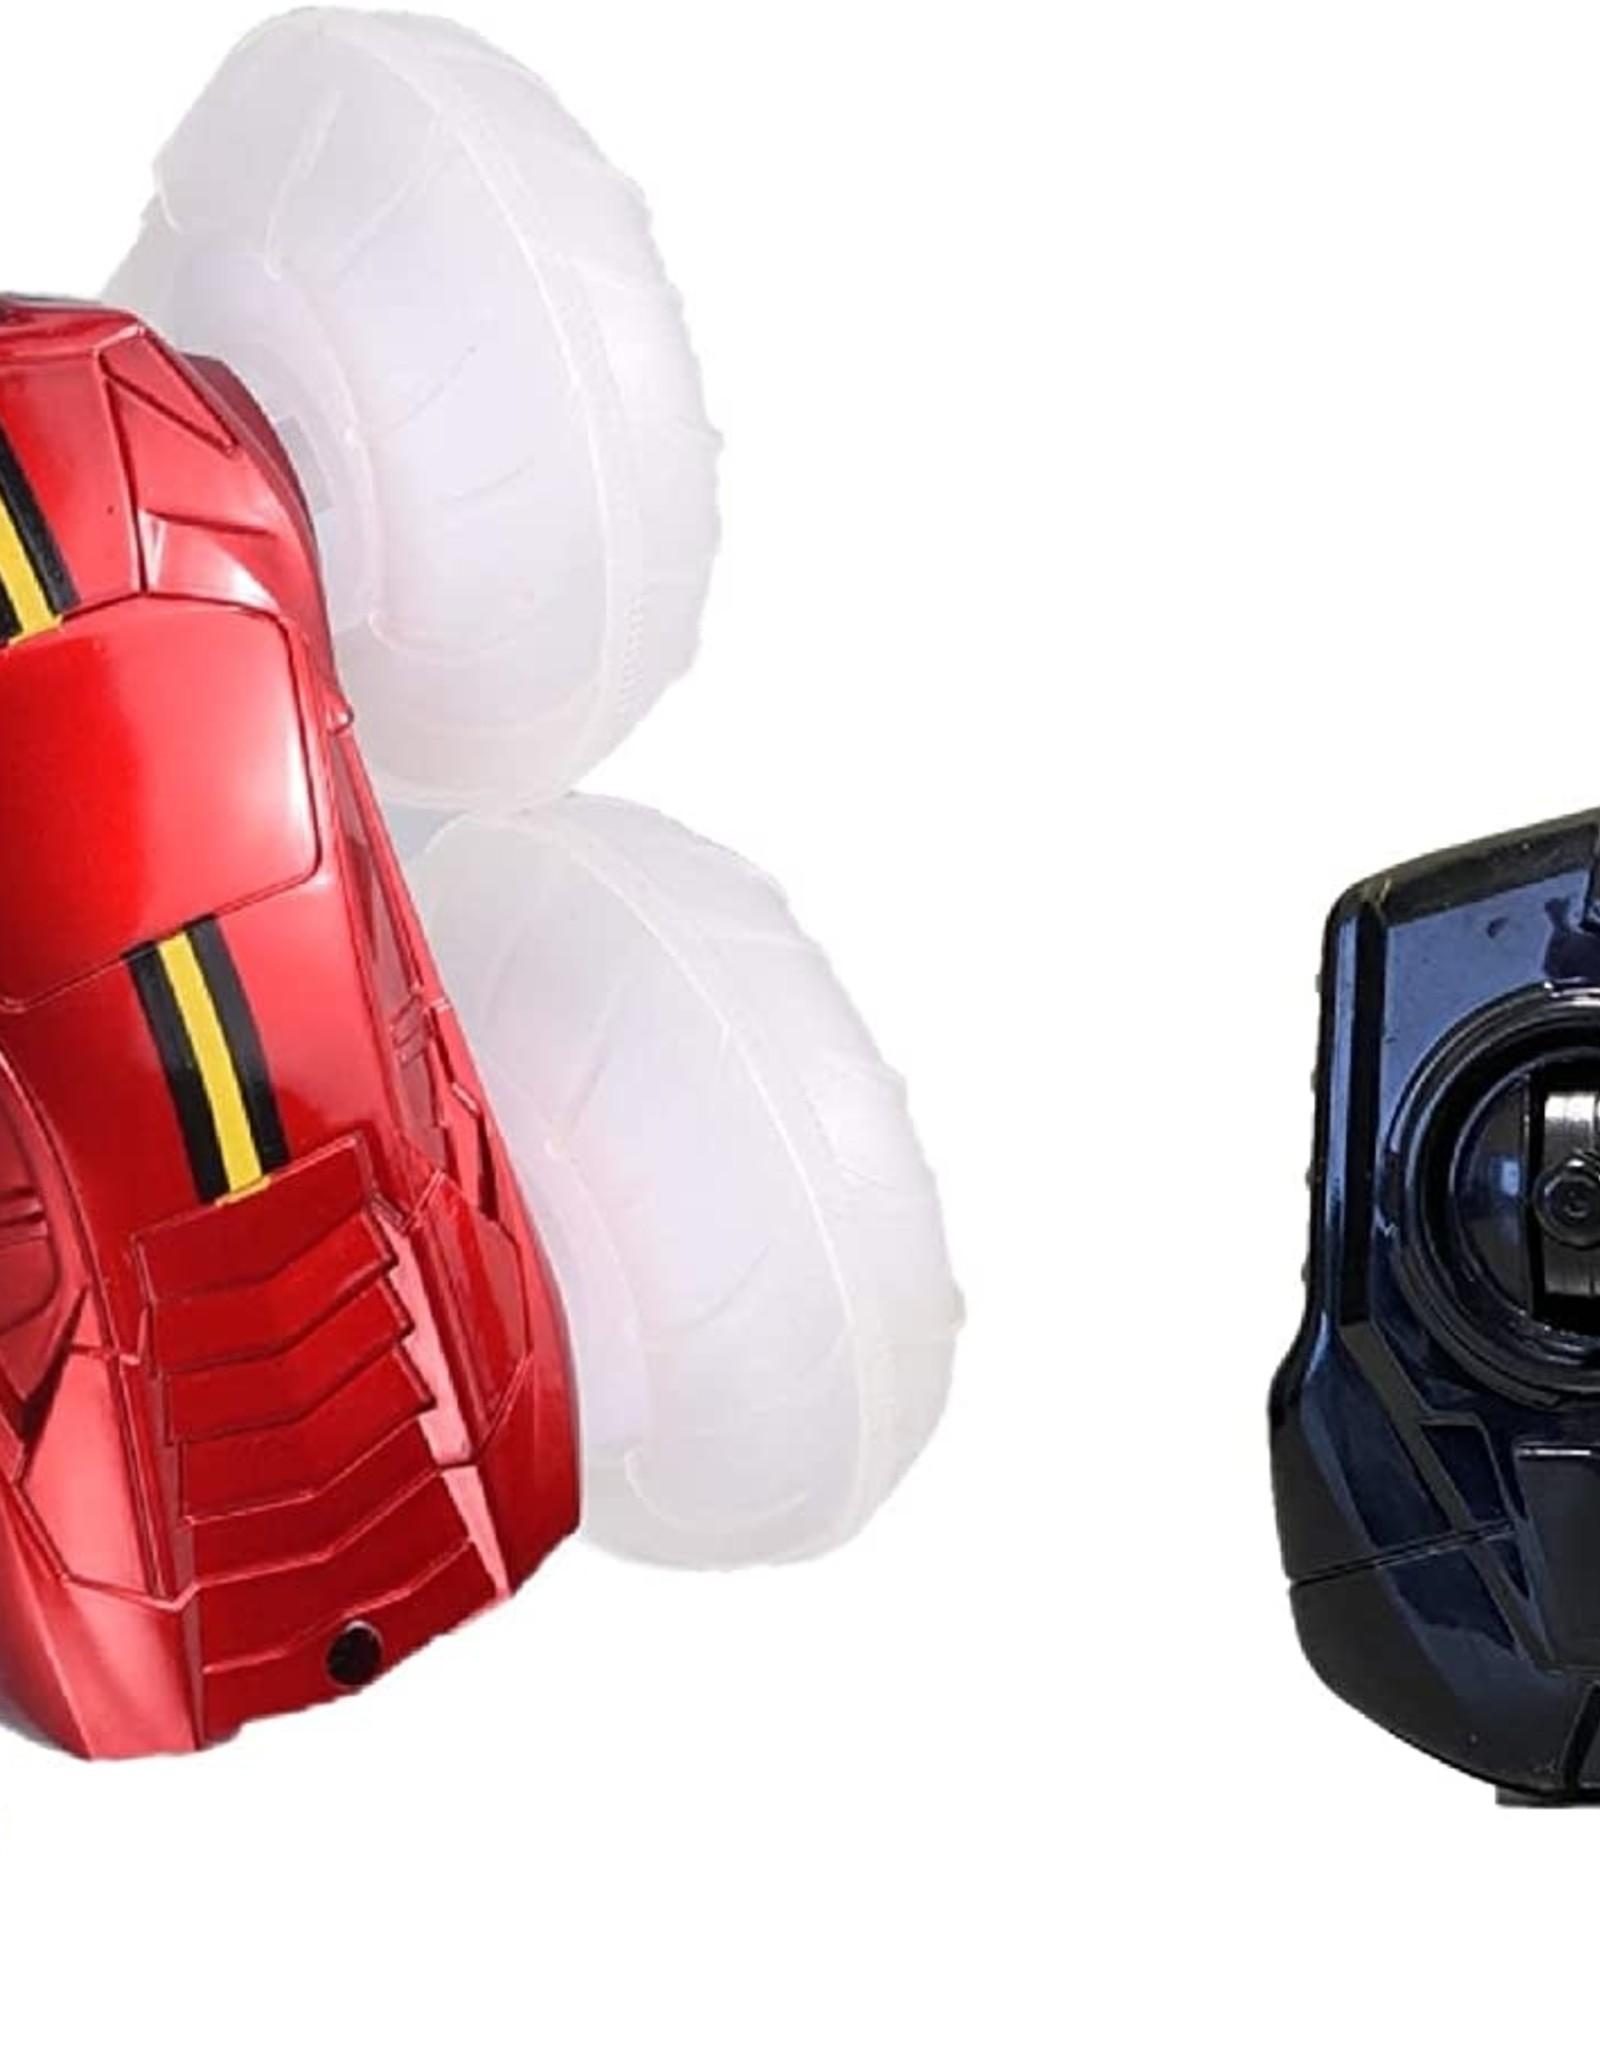 Turbo Twister Flip Racer - Red